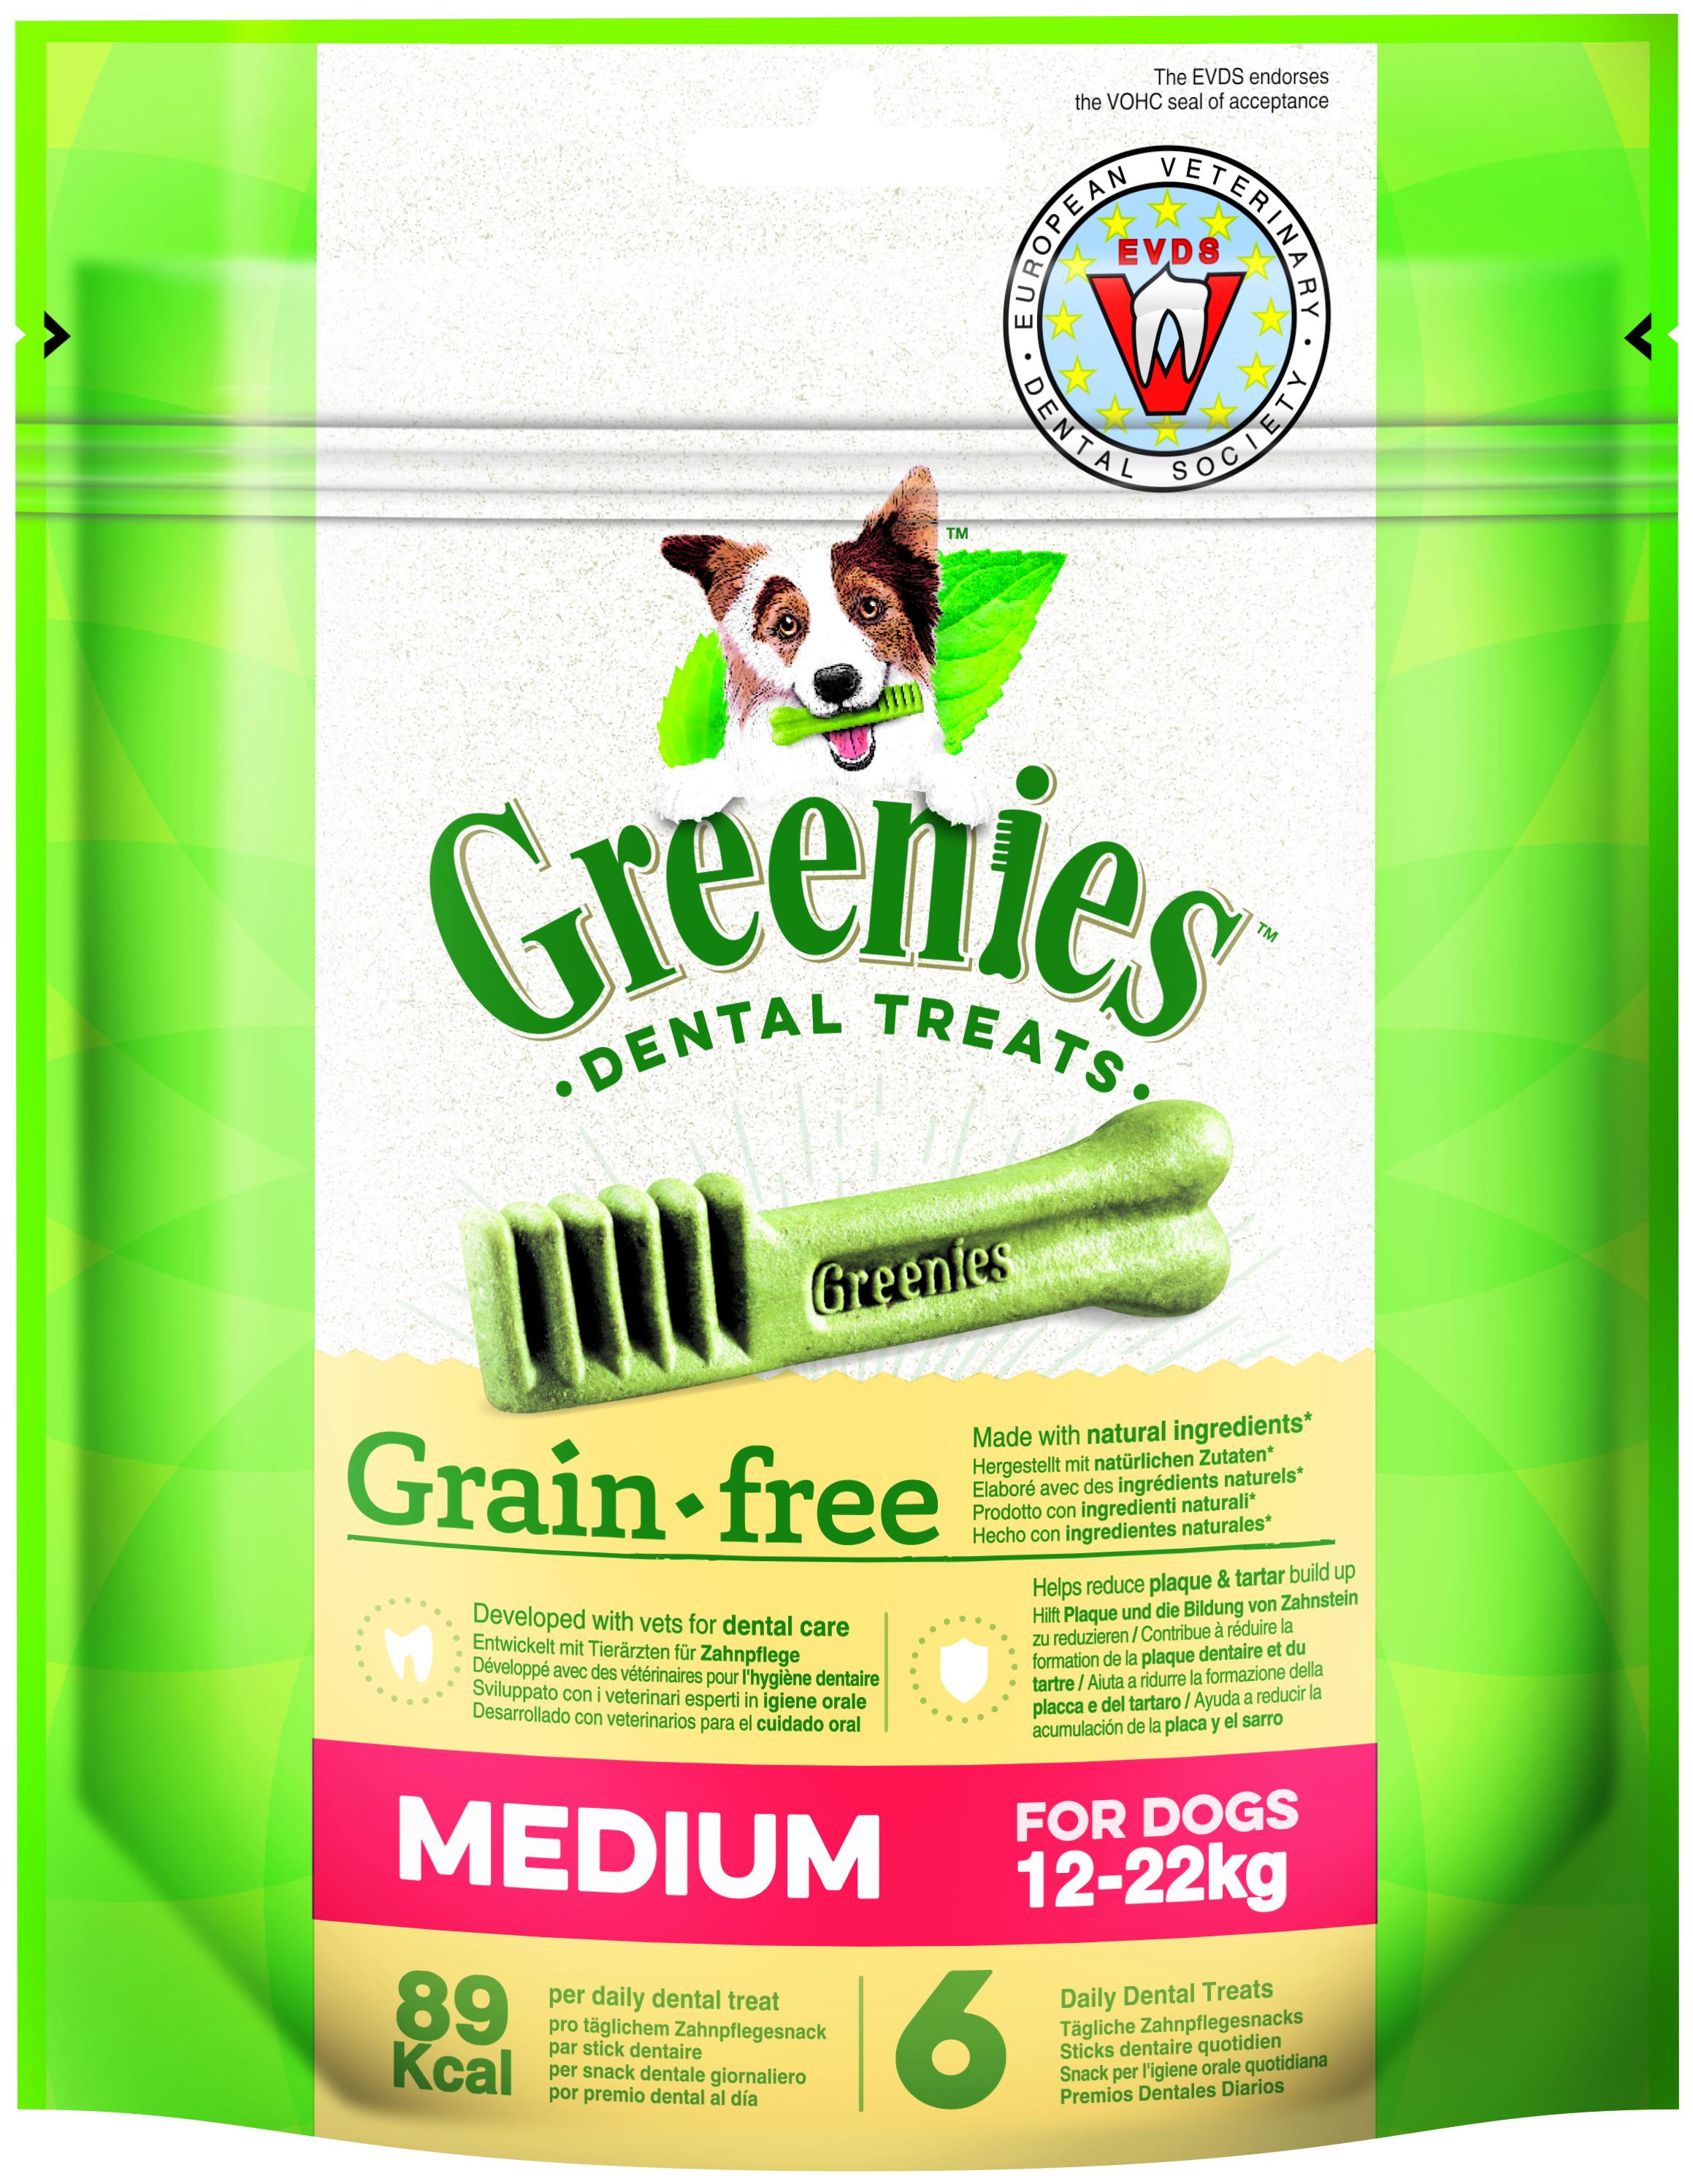 Greenies GRAIN FREE MEDIUM 170g